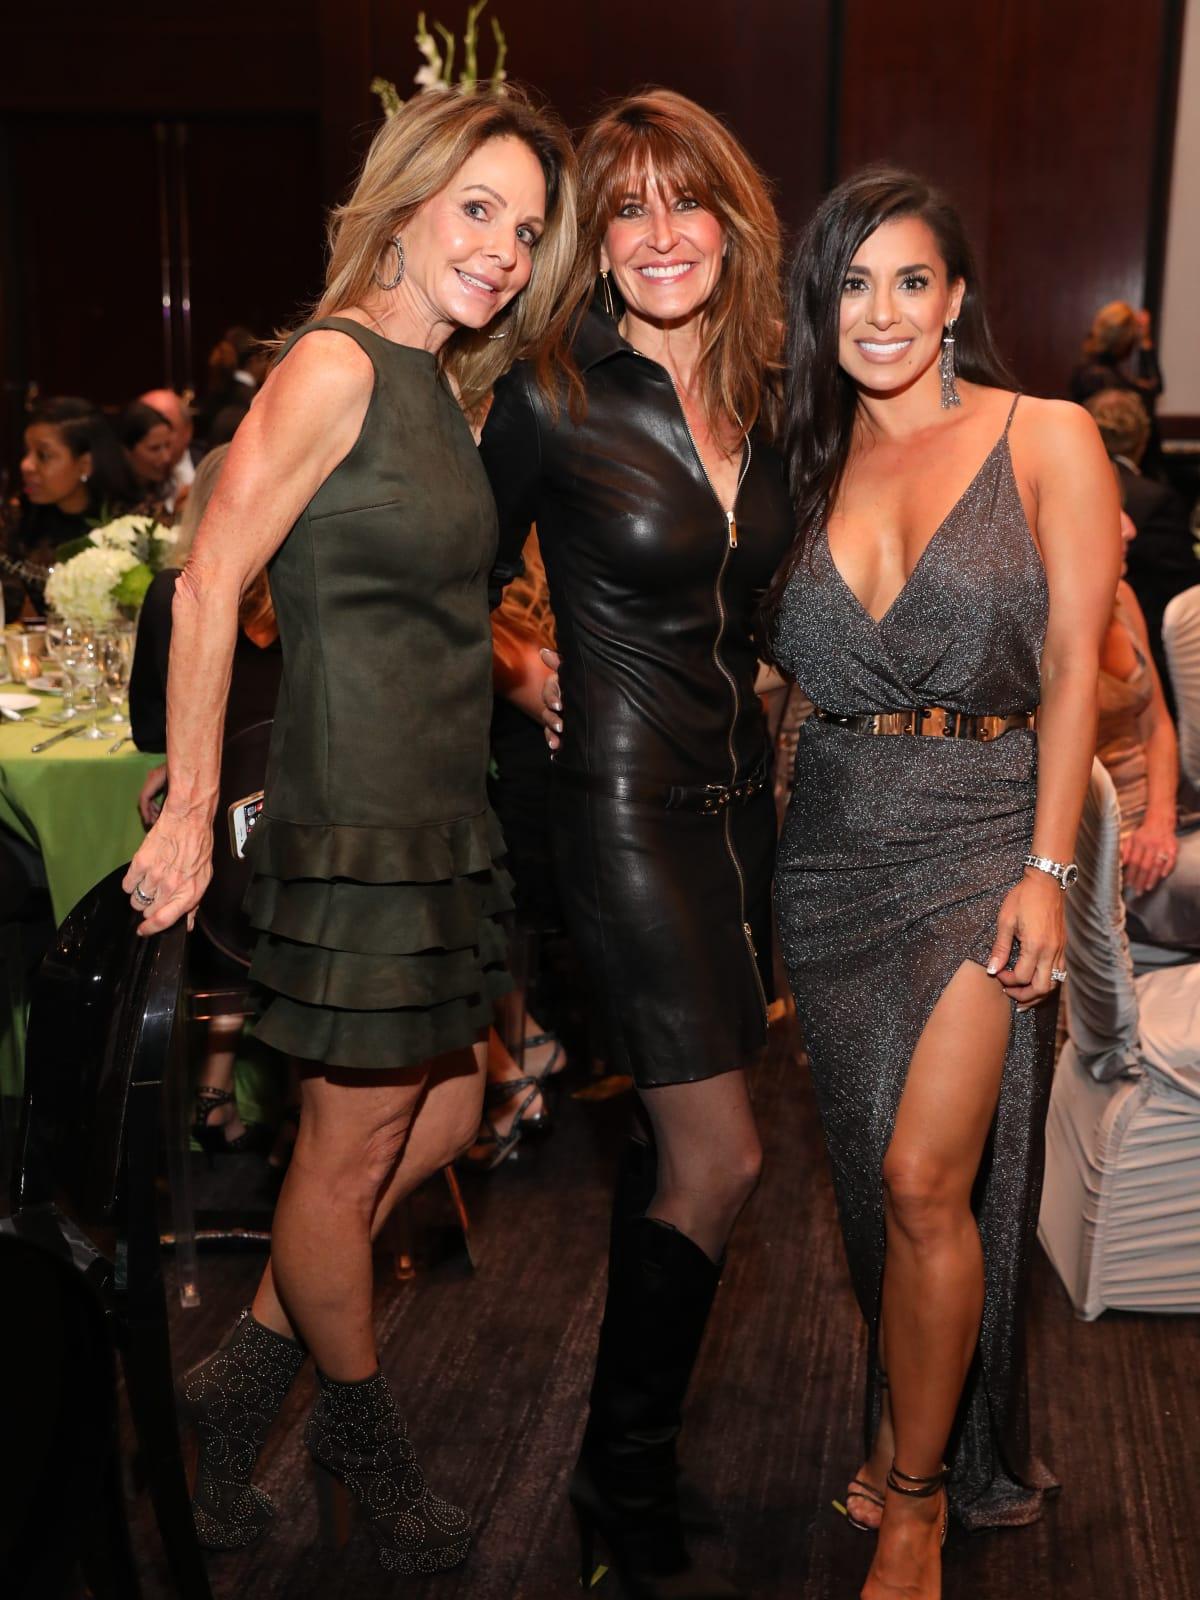 Kristi Gilliam, Annie Amante, Rachel Bagwell at Festari Gala